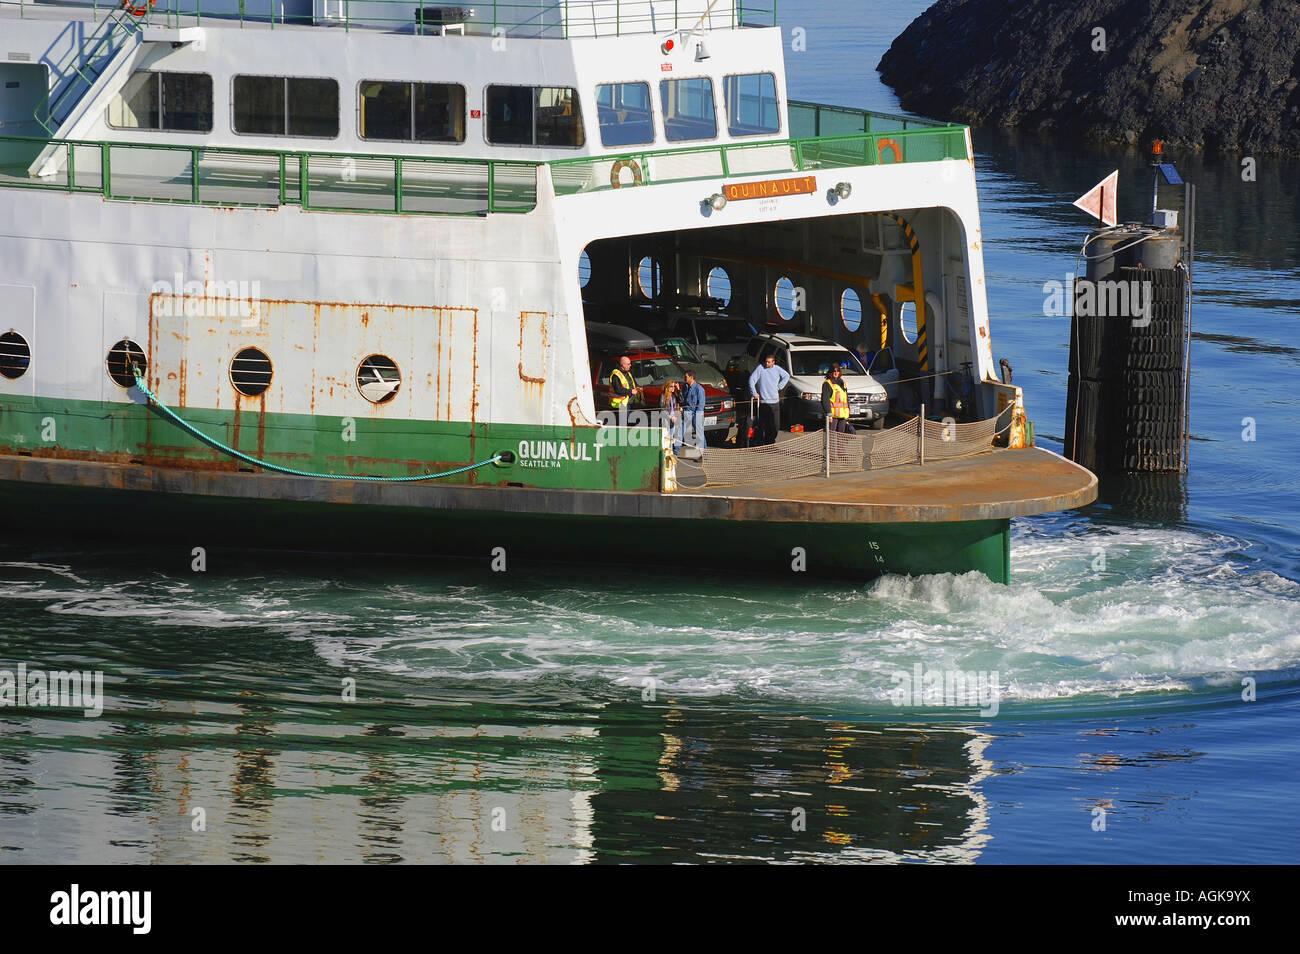 794d23daeb64 Painet jm7089 washington tacoma puget sound tahlequah ferry vashon island  point defiance carriage carrier carry carrying